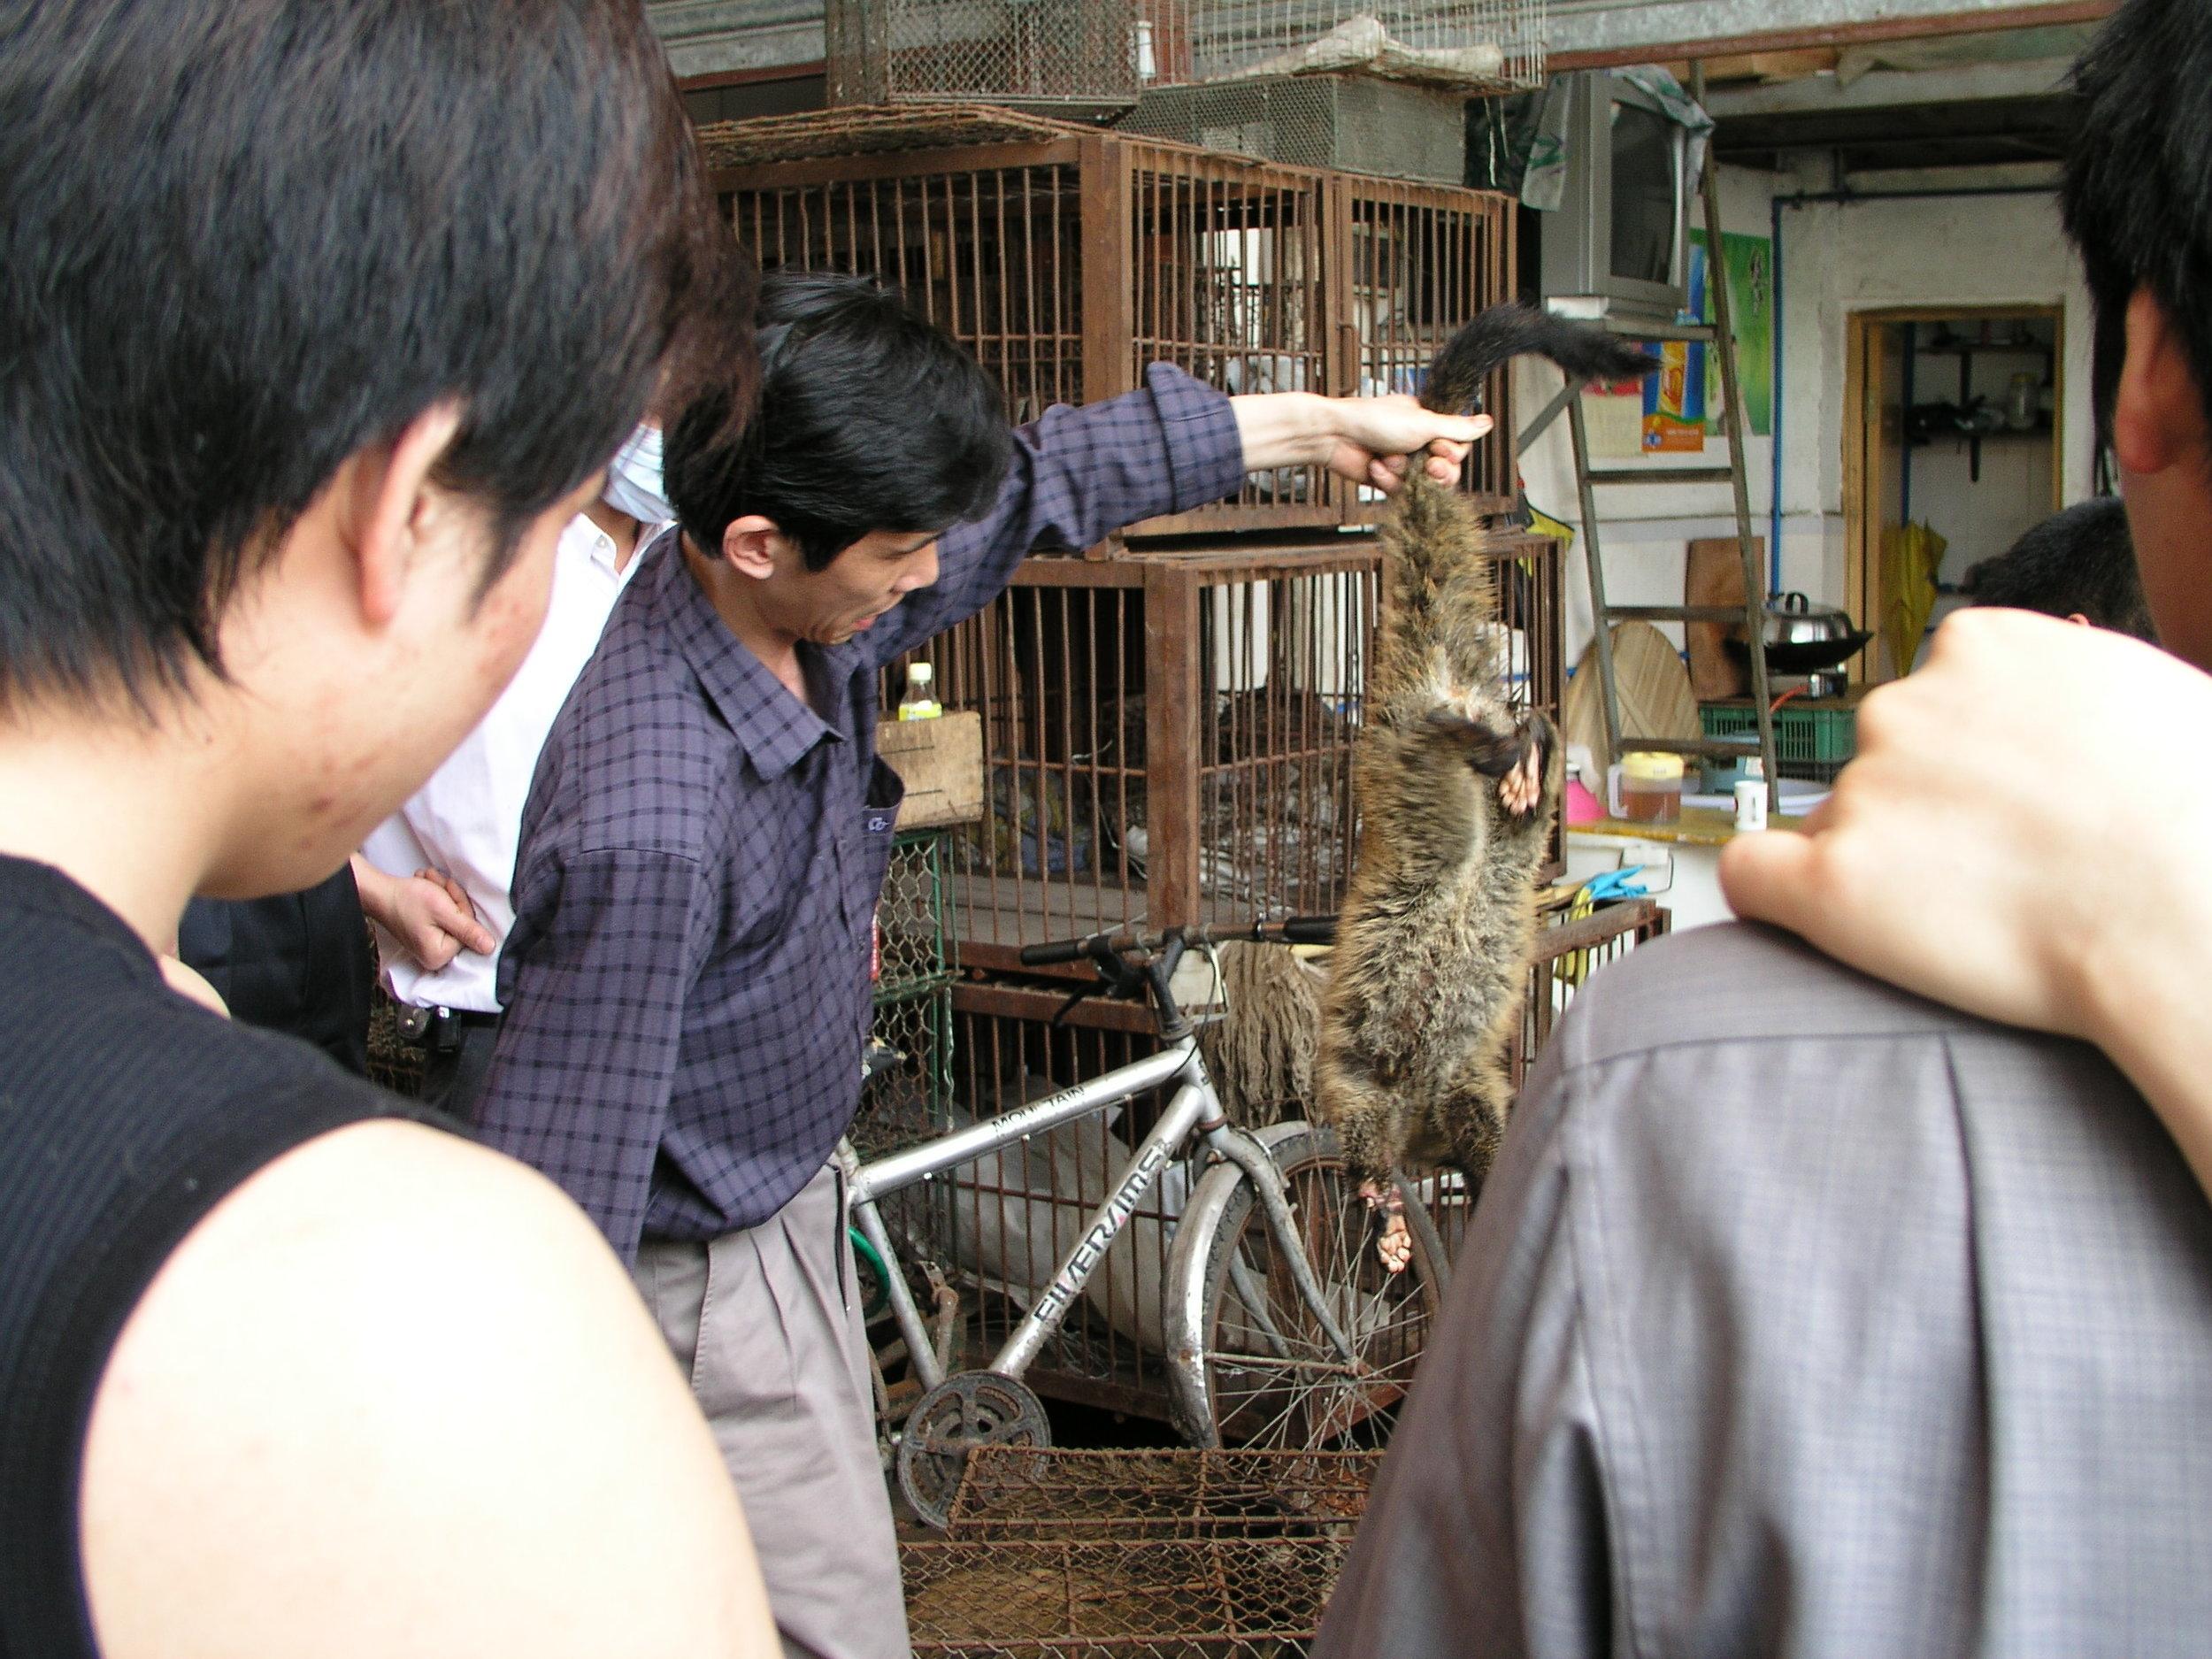 Chau Tau Market in Guangzhou where the SARS epidemic started from live civets .5.JPG